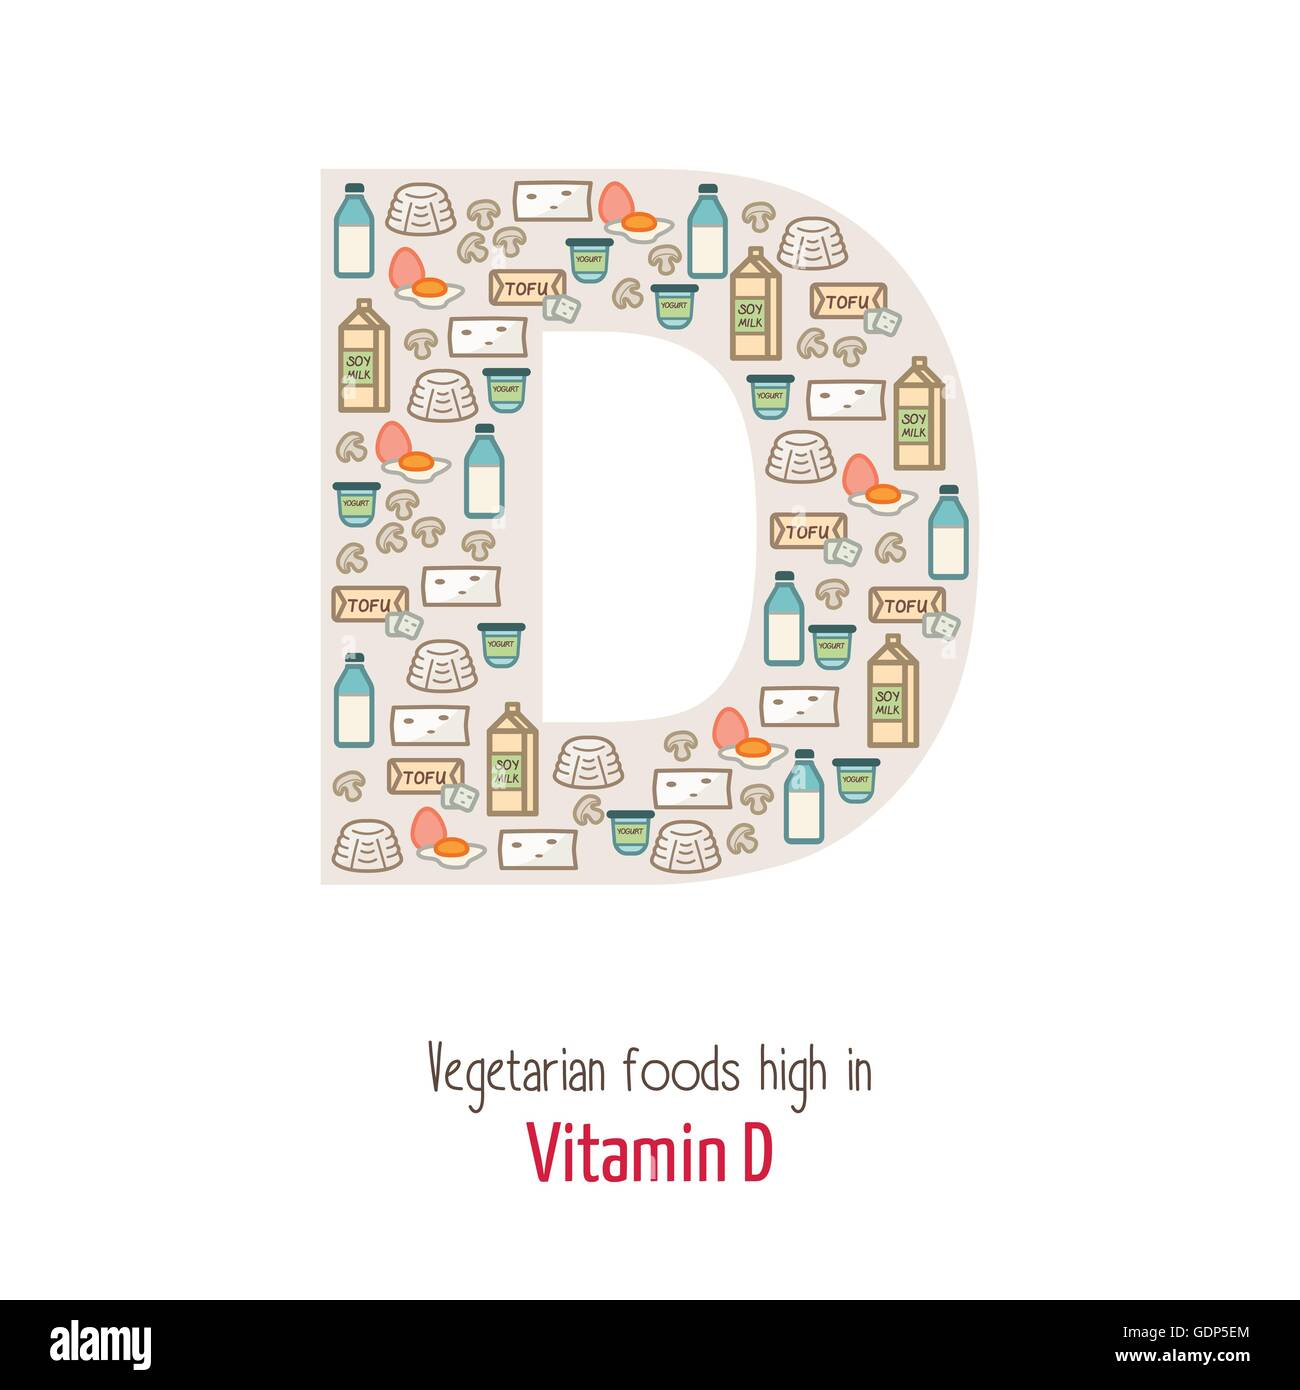 Vgetarian Lebensmittel Höchsten Vitamin D D Brief Form Ernährung